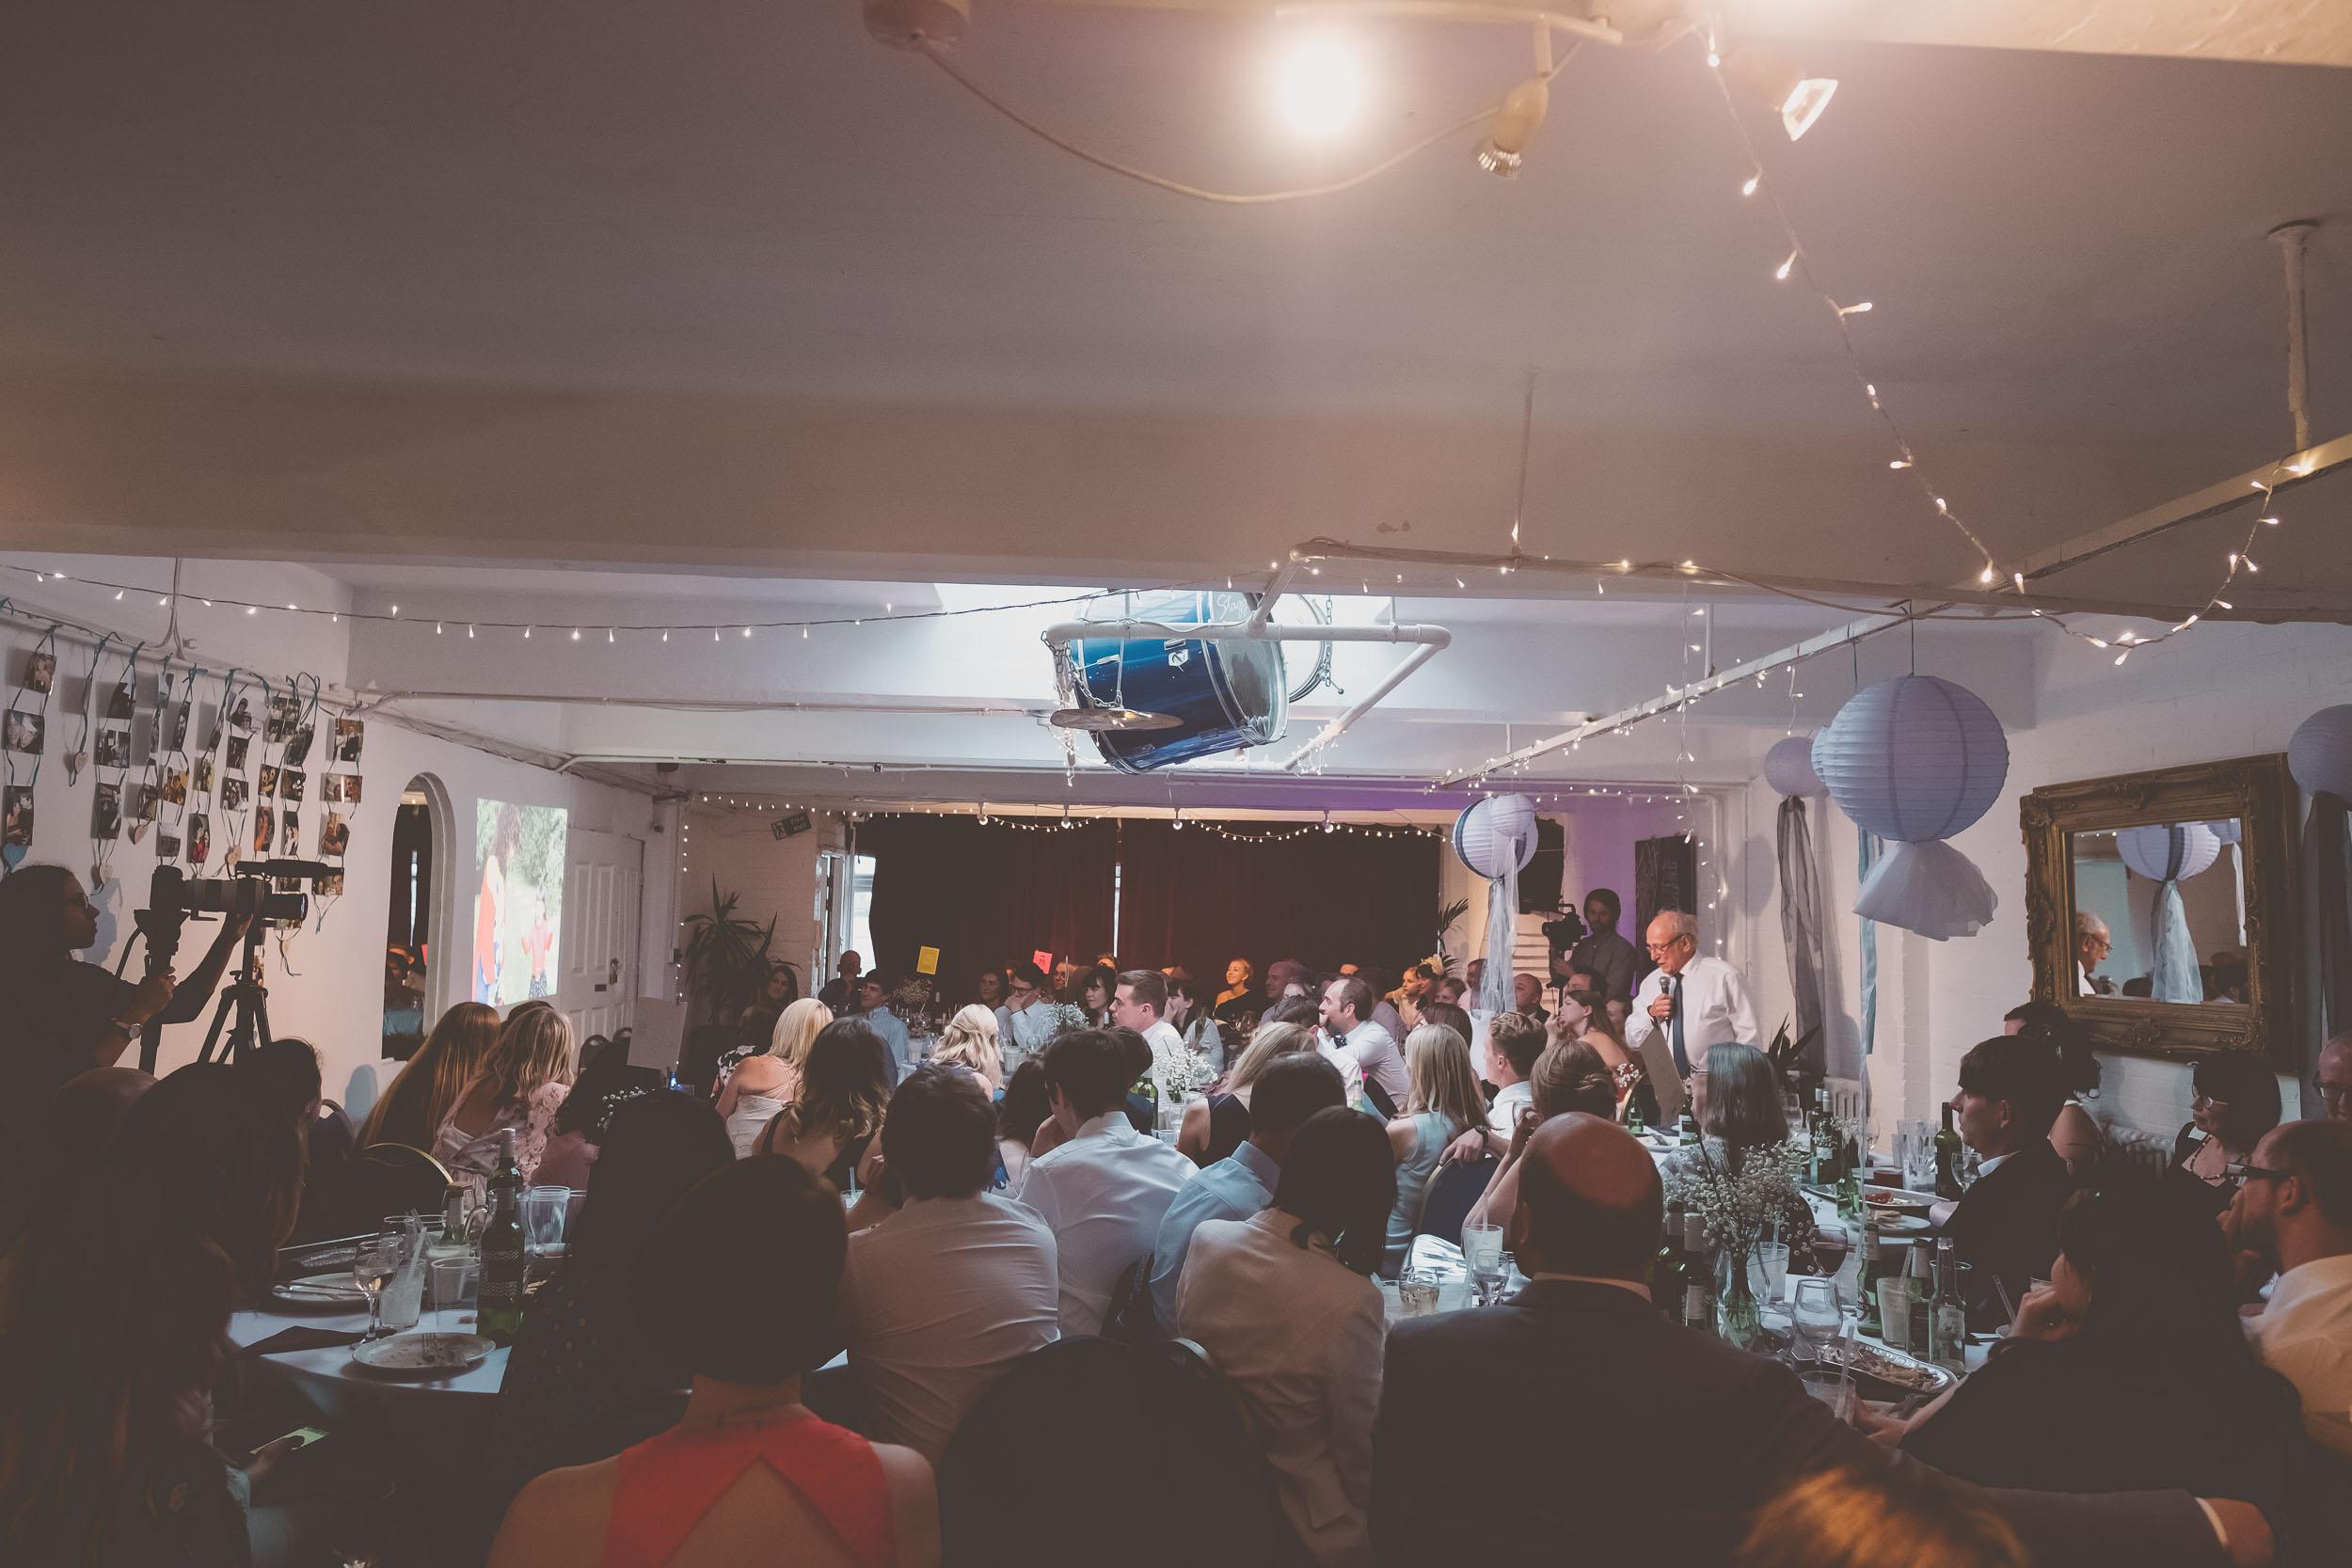 islington-town-hall-4th-floor-studios-wedding356.jpg